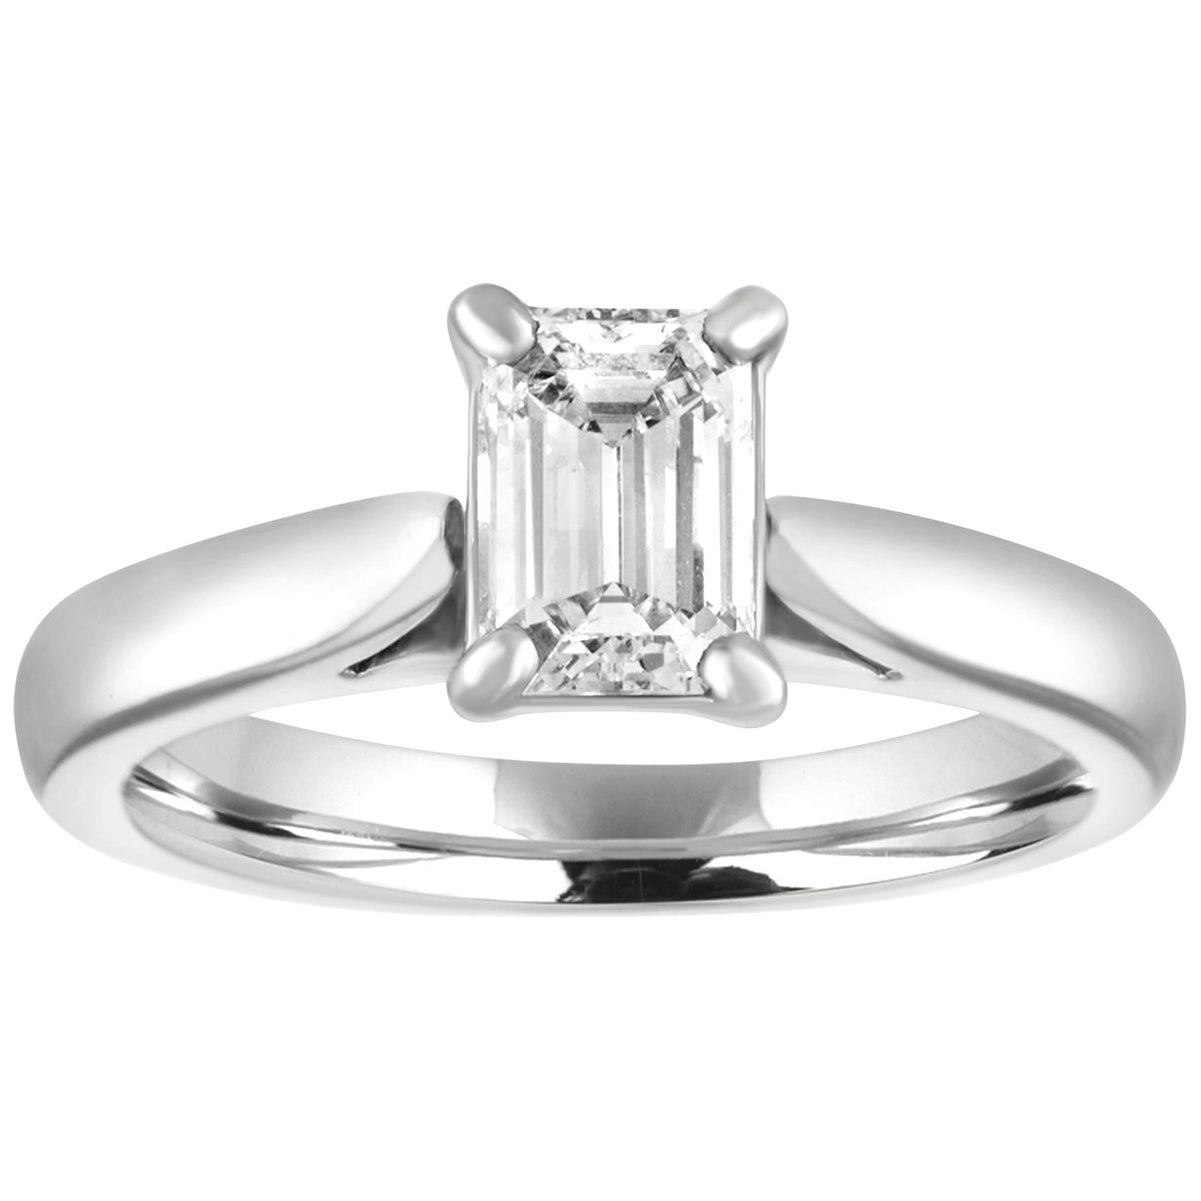 GIA Certified 0.71 Carat D VVS1 Diamond Solitaire Platinum Engagement Ring